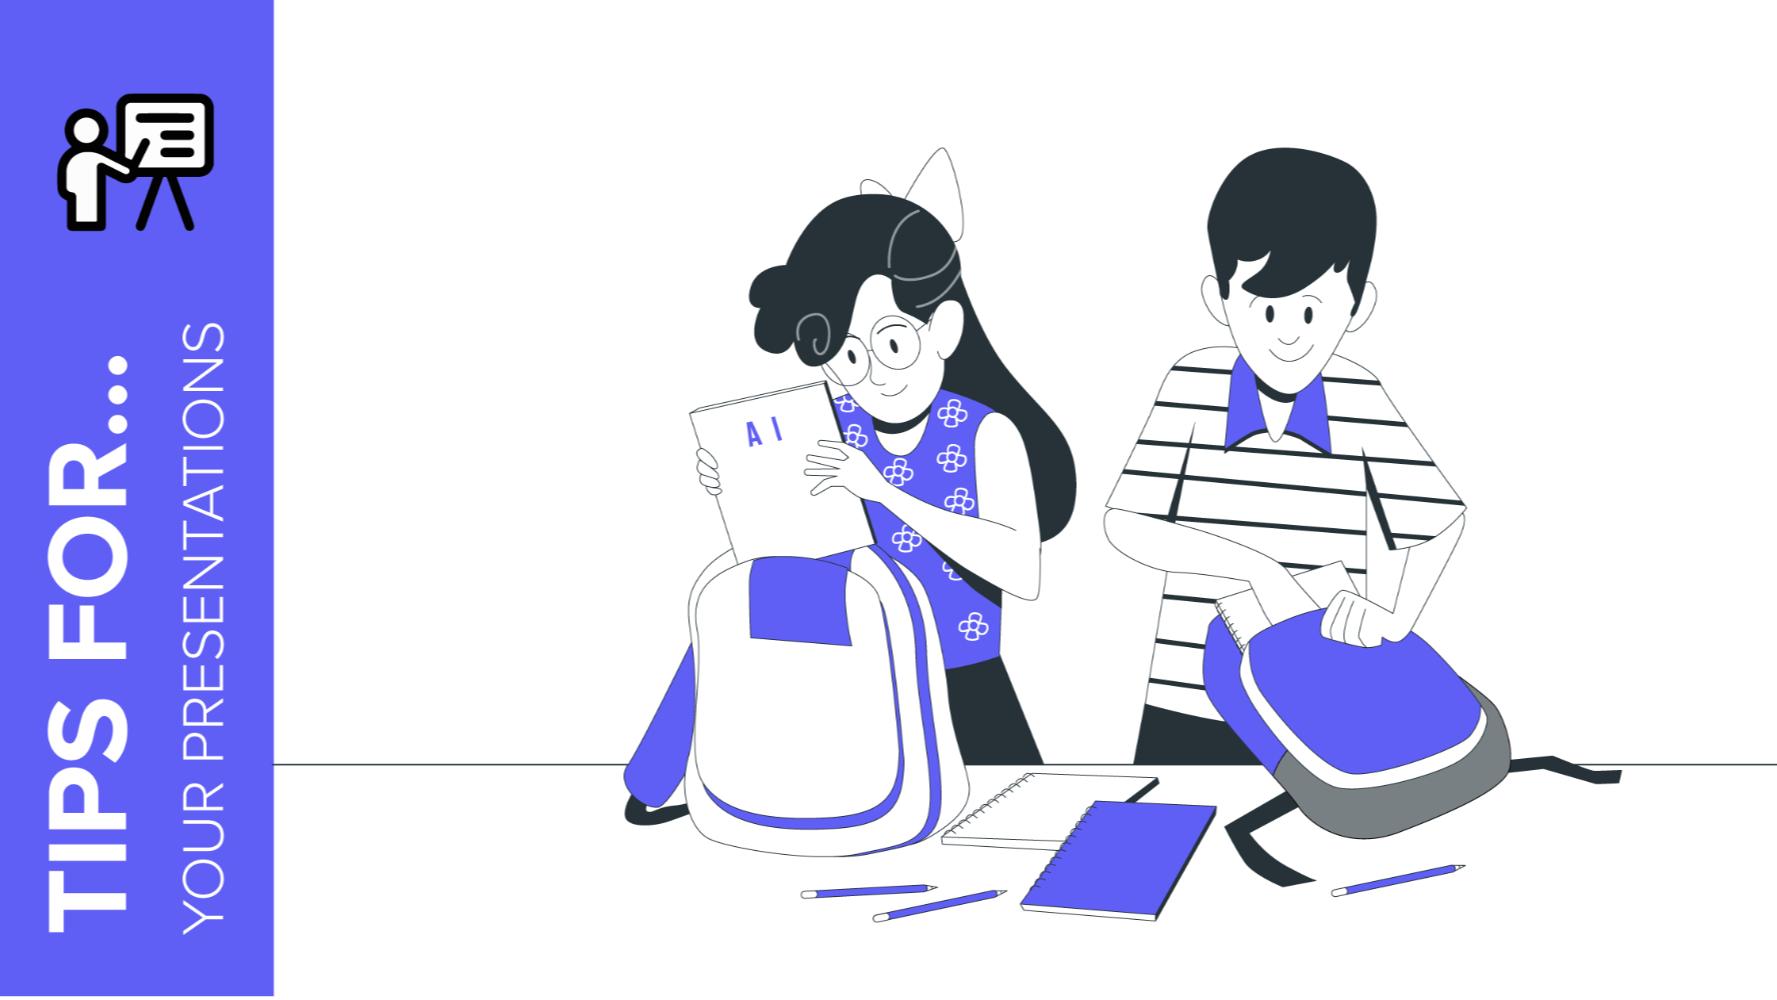 5 Tips to Get the School Year Off to a Good Start | Tutoriels et conseils pour vos présentations